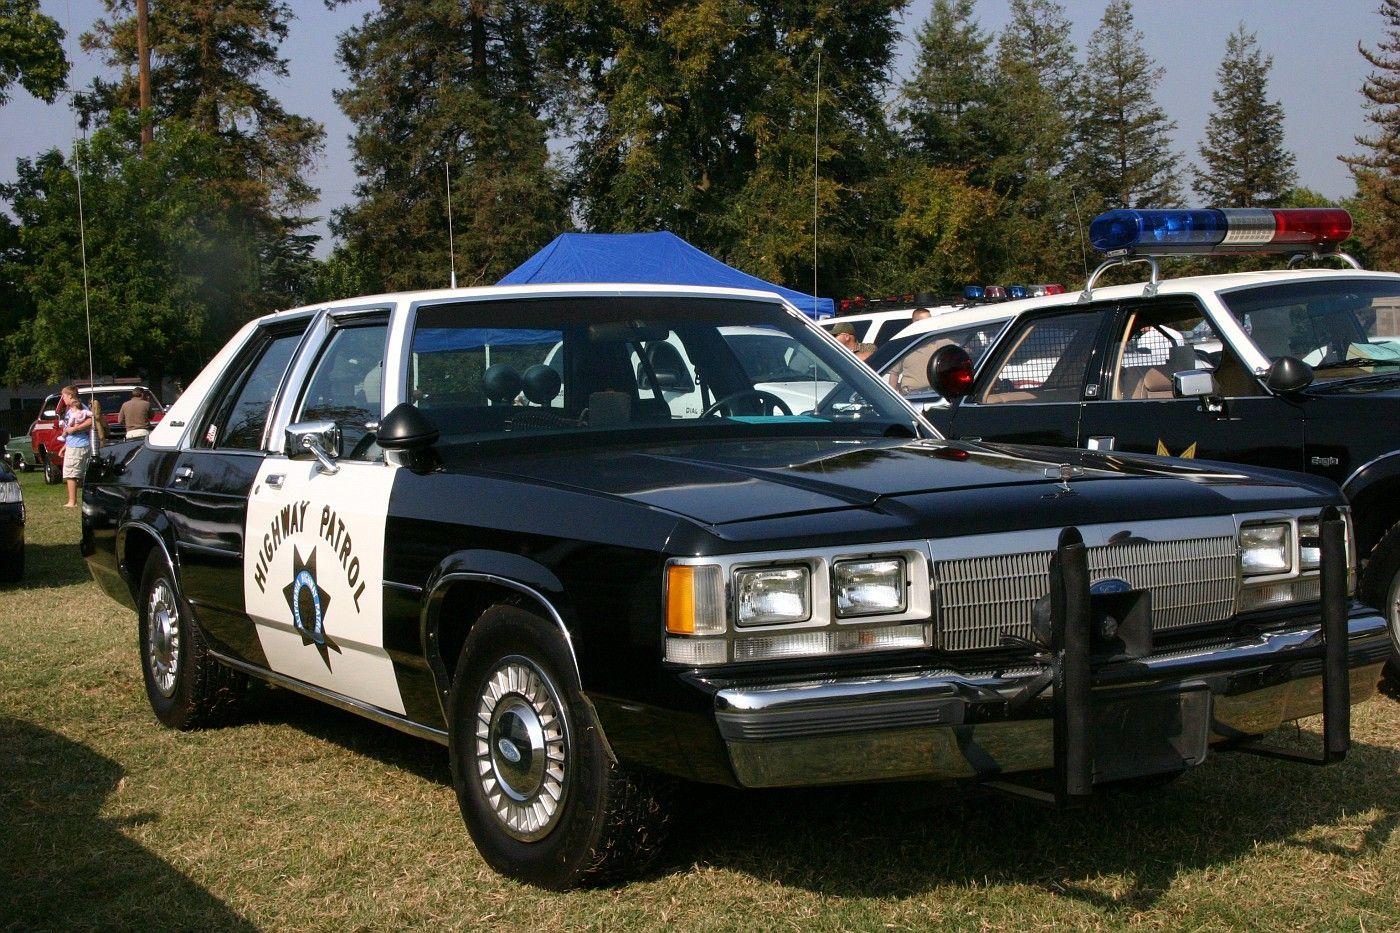 CA - California Highway Patrol | Cars | Police cars